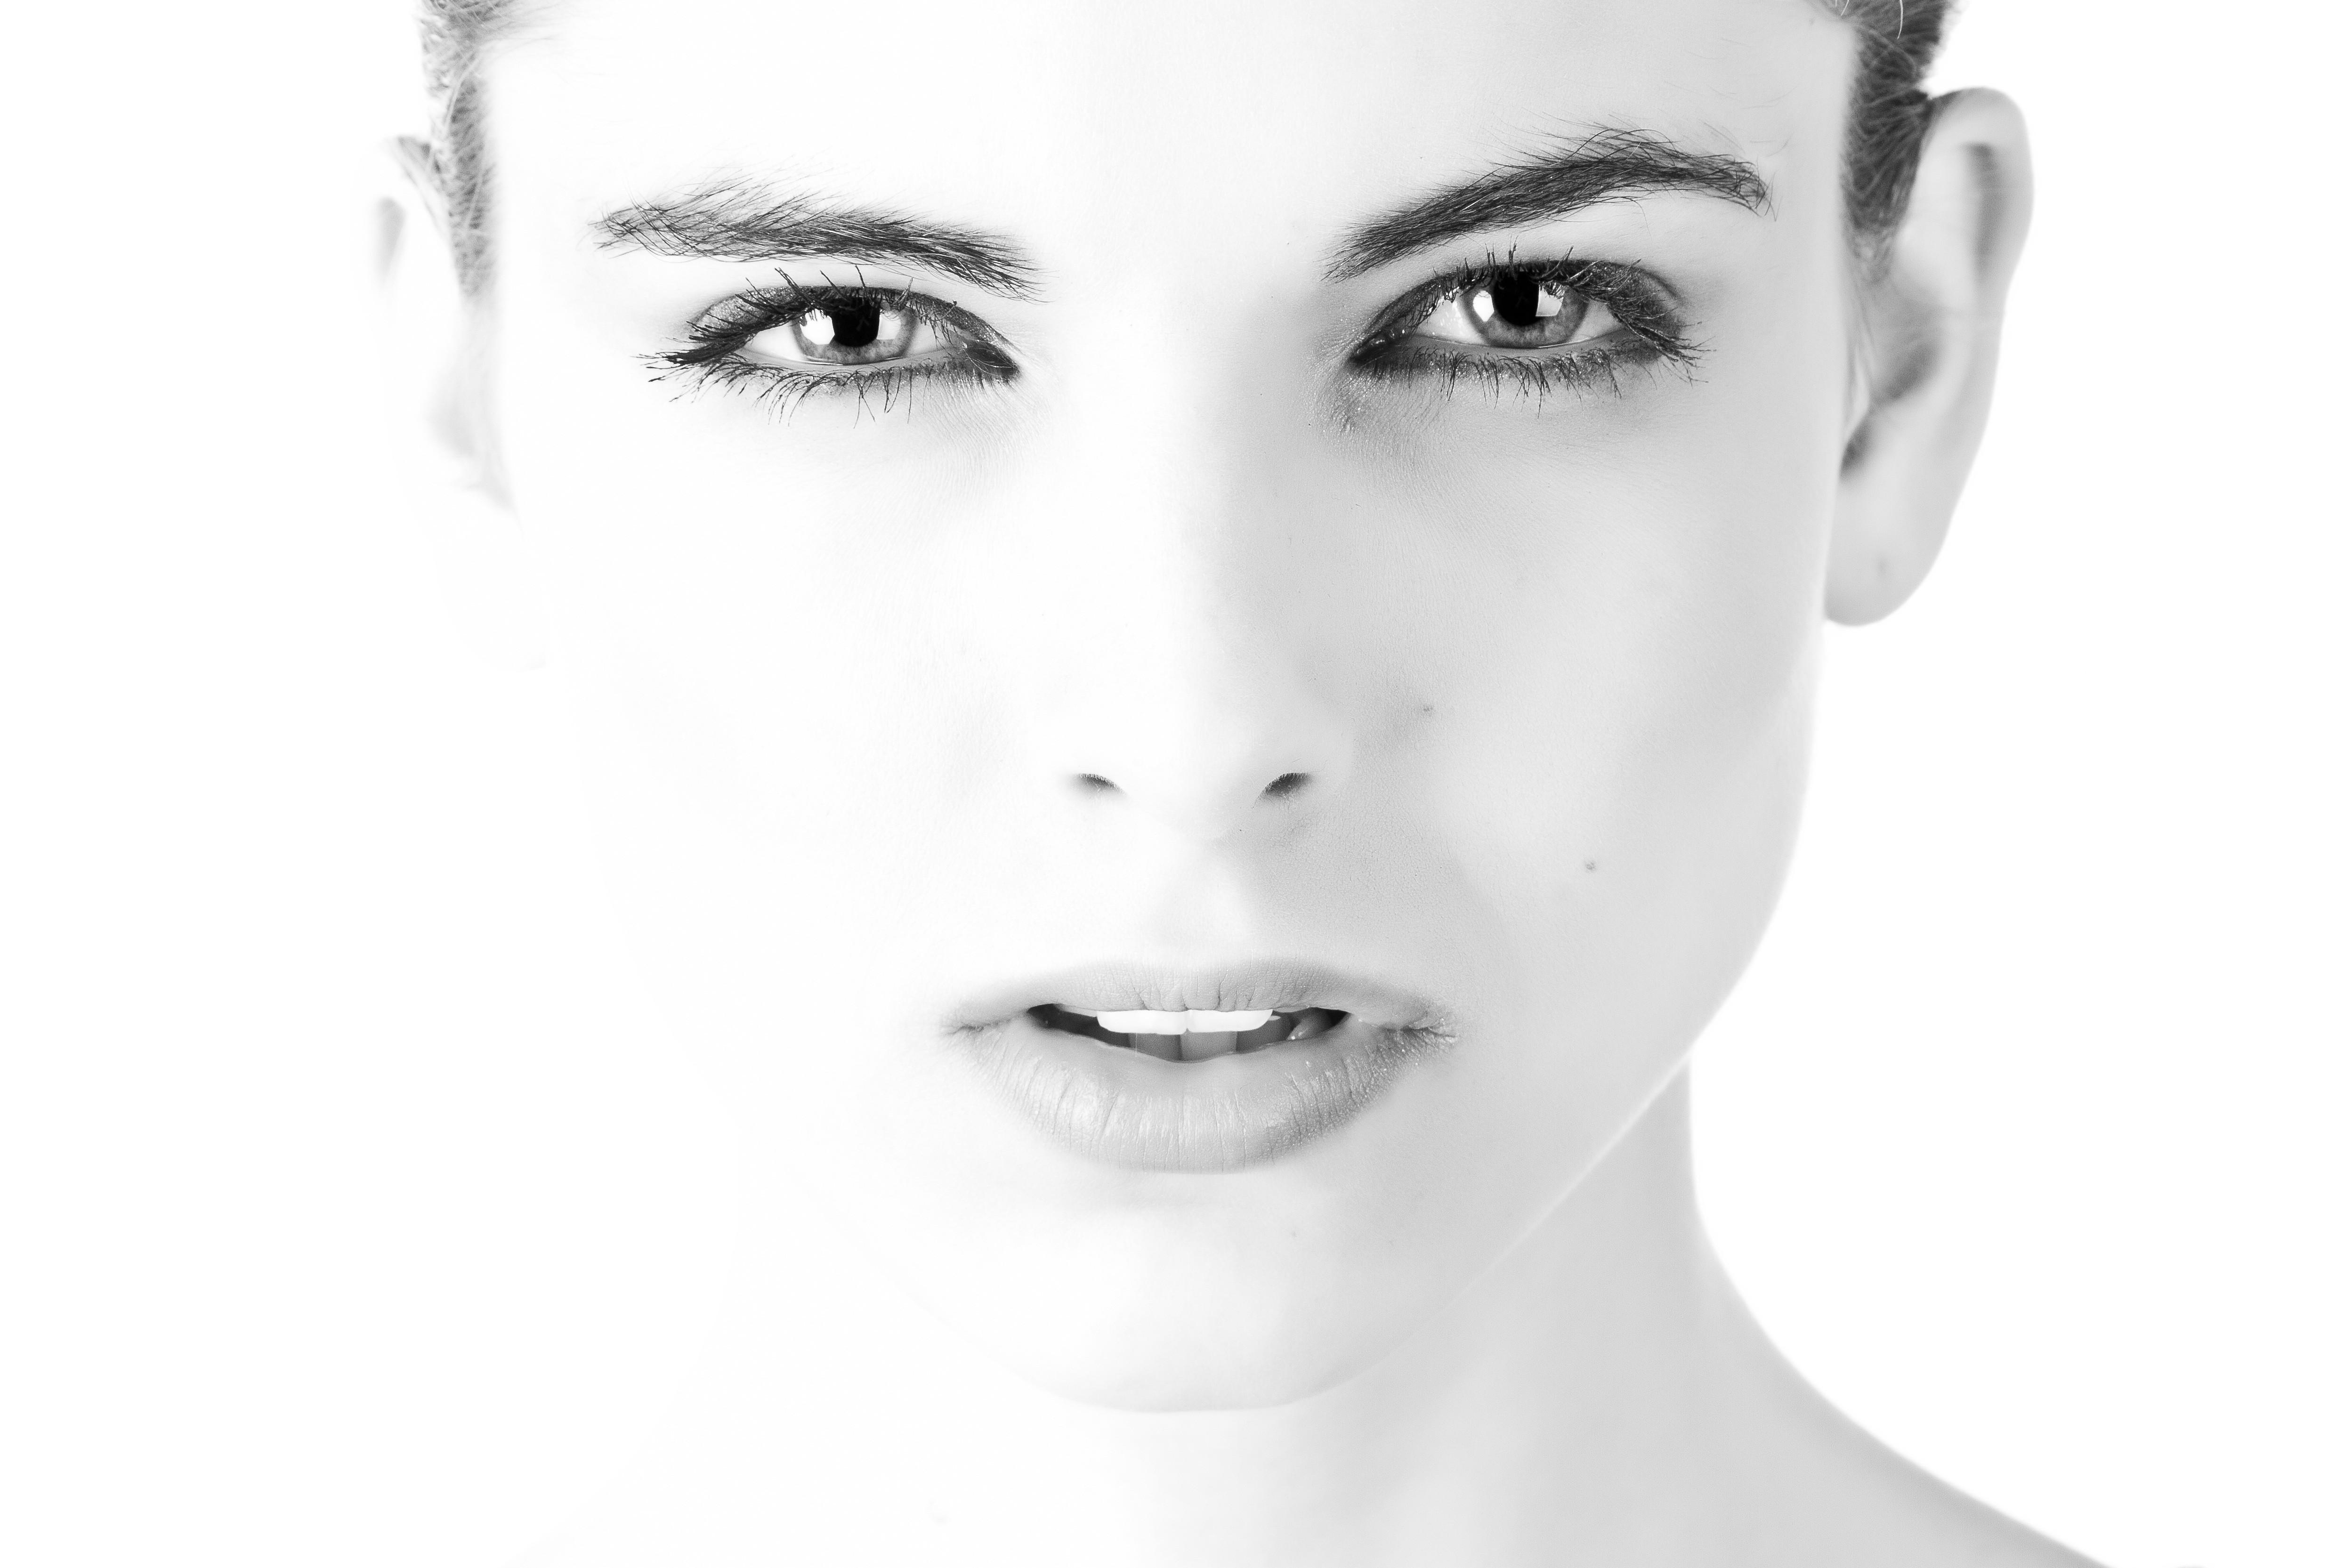 Área facial